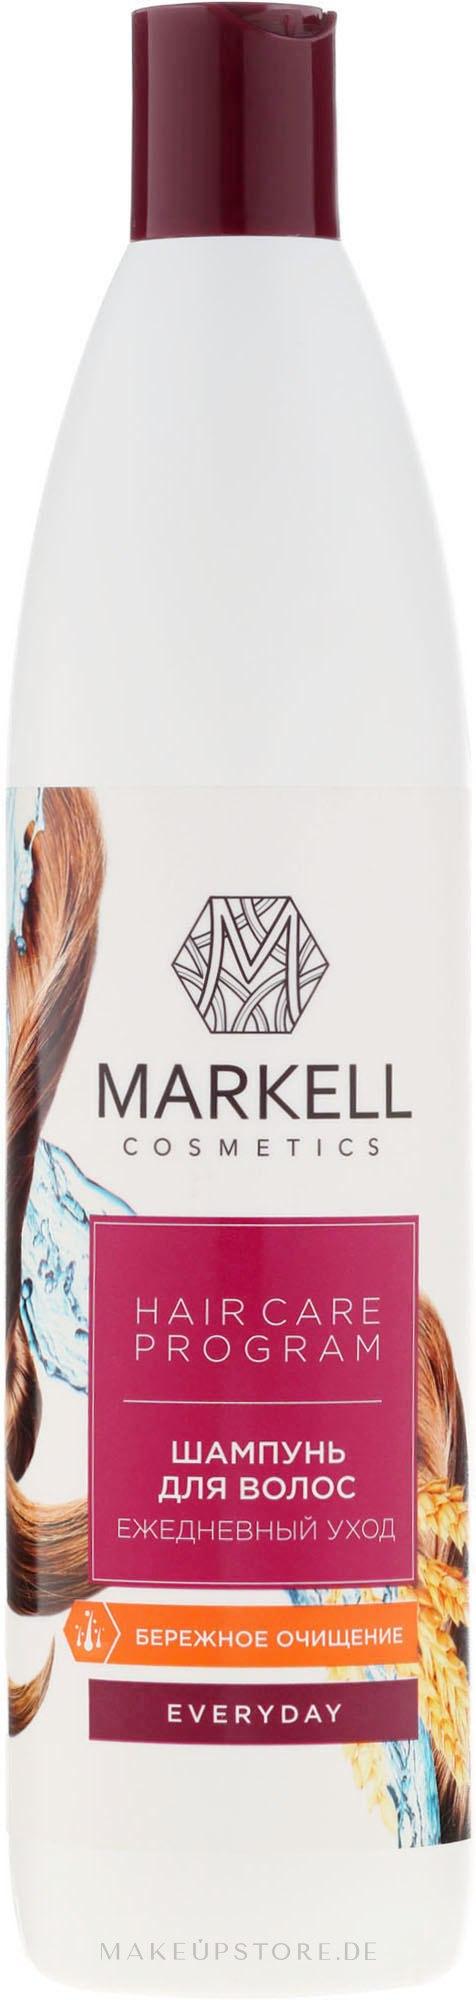 "Shampoo ""Tägliche Pflege"" - Markell Cosmetics Everyday — Bild 500 ml"